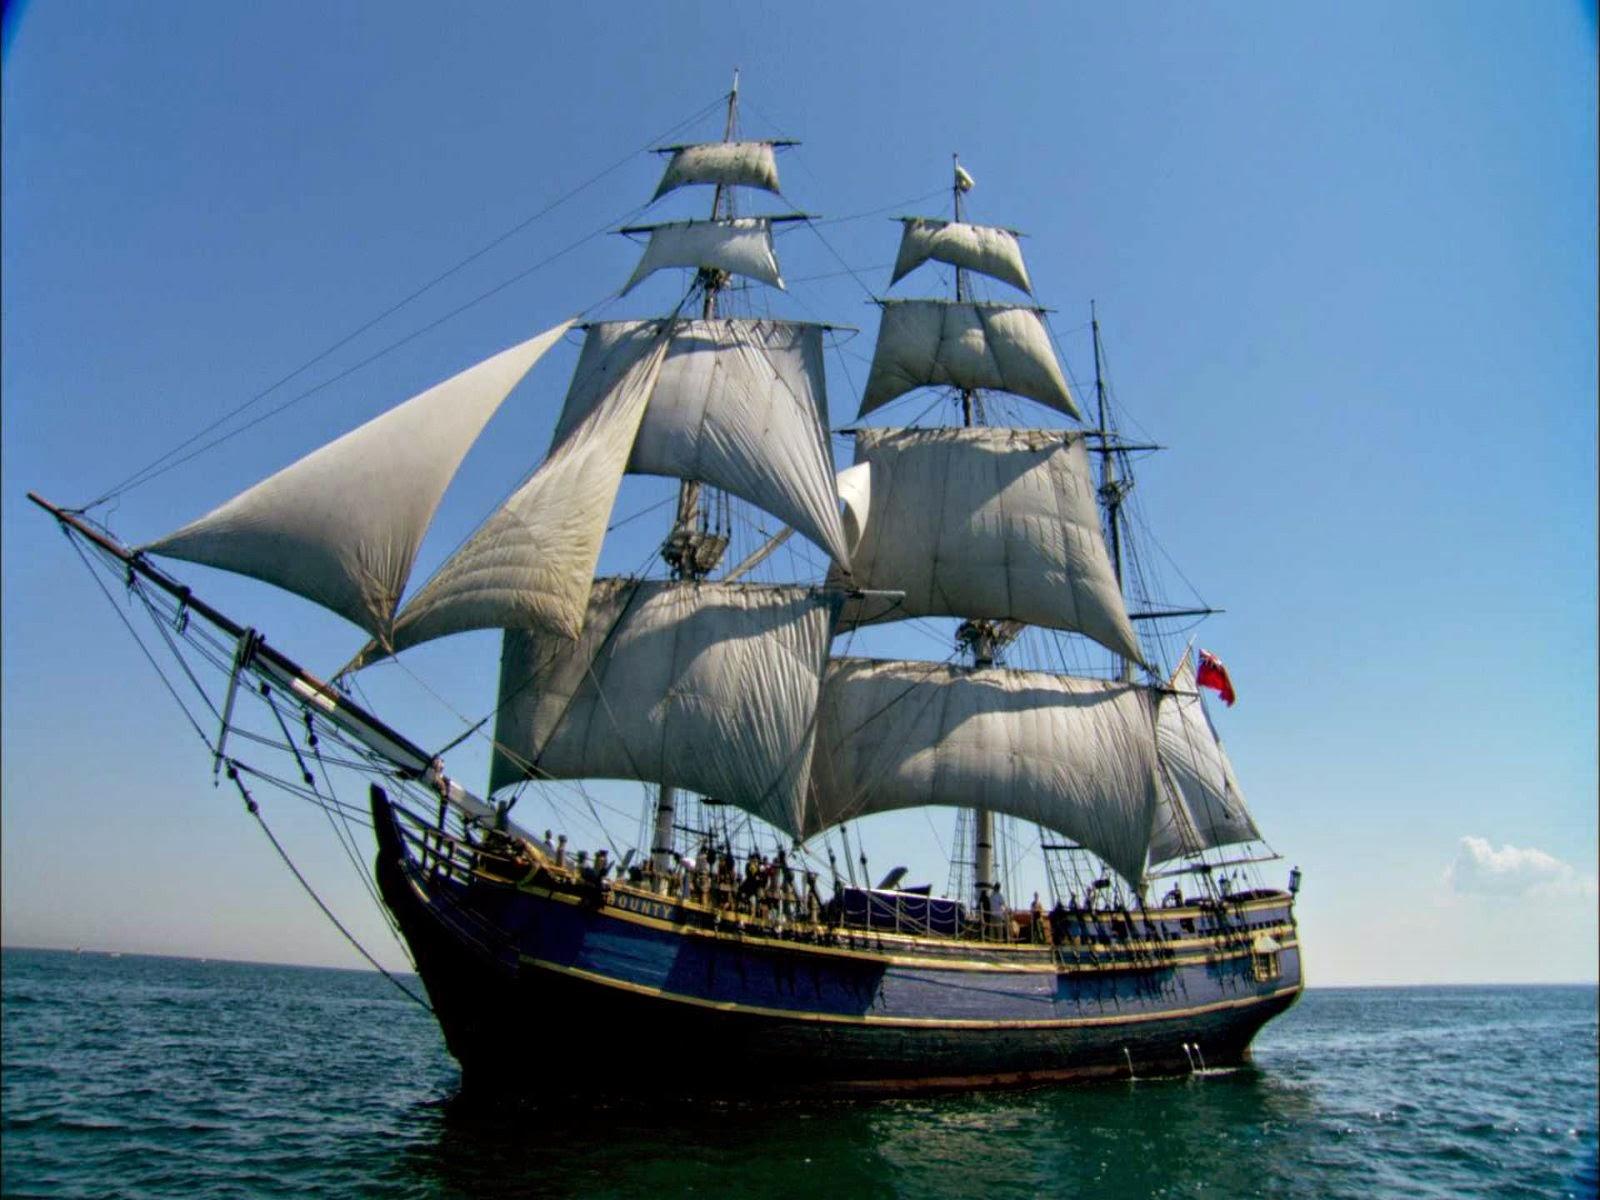 Mon blog perso de ma vie en mer - Photo de bateau pirate ...